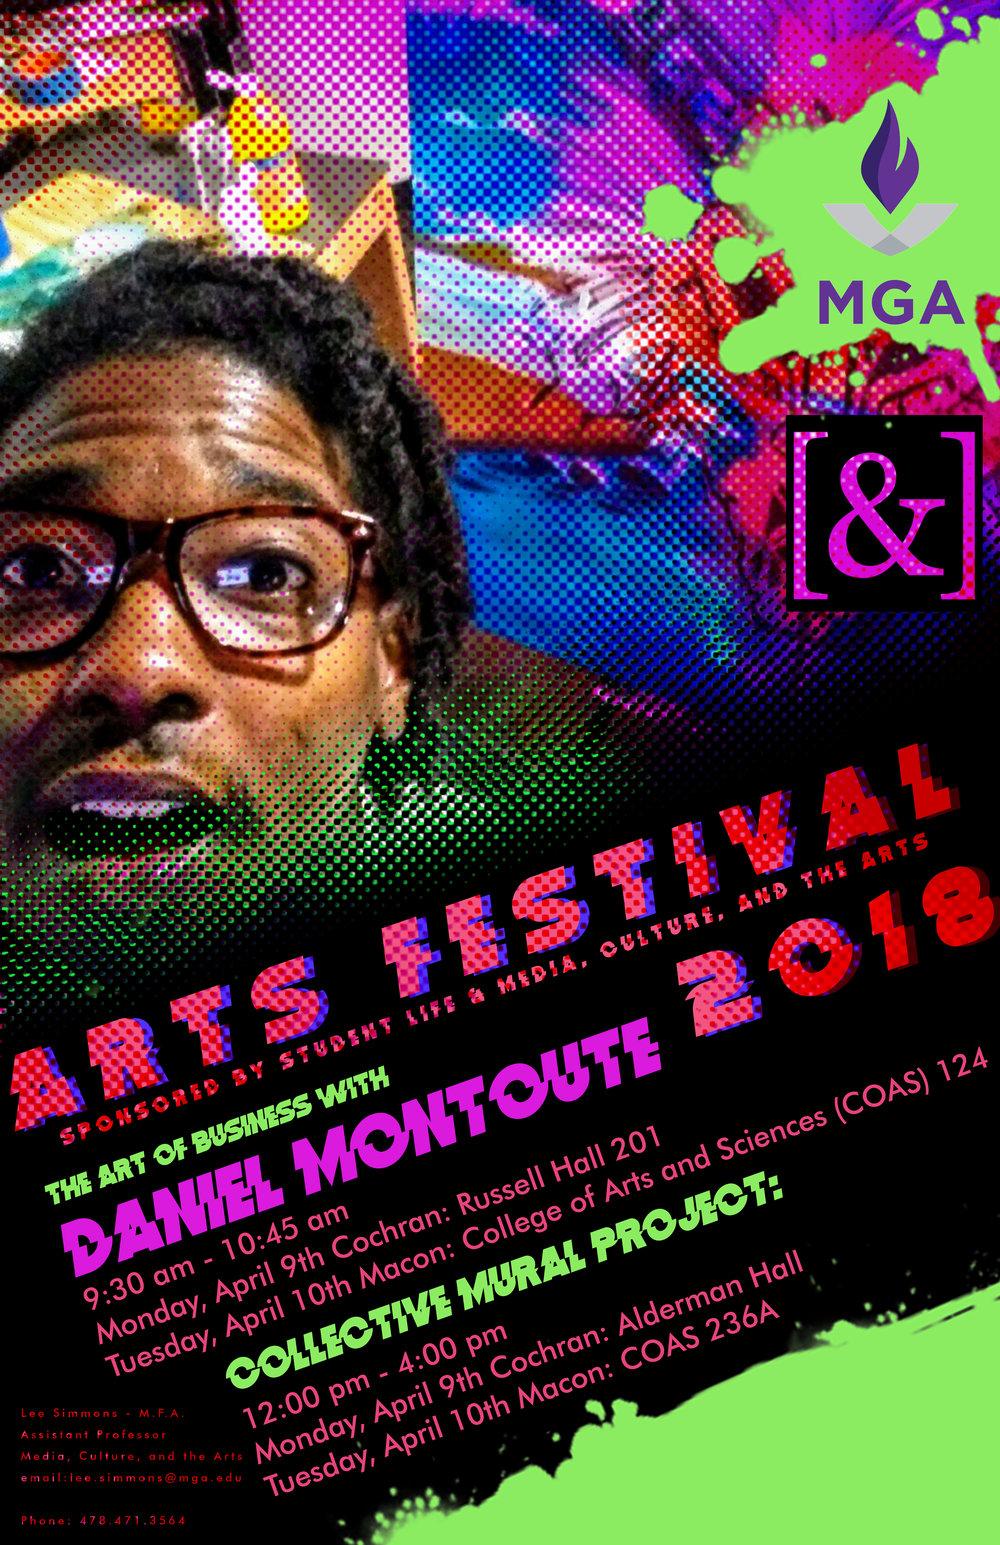 Arts Festival 2018 - Daniel -4.9.18.jpg